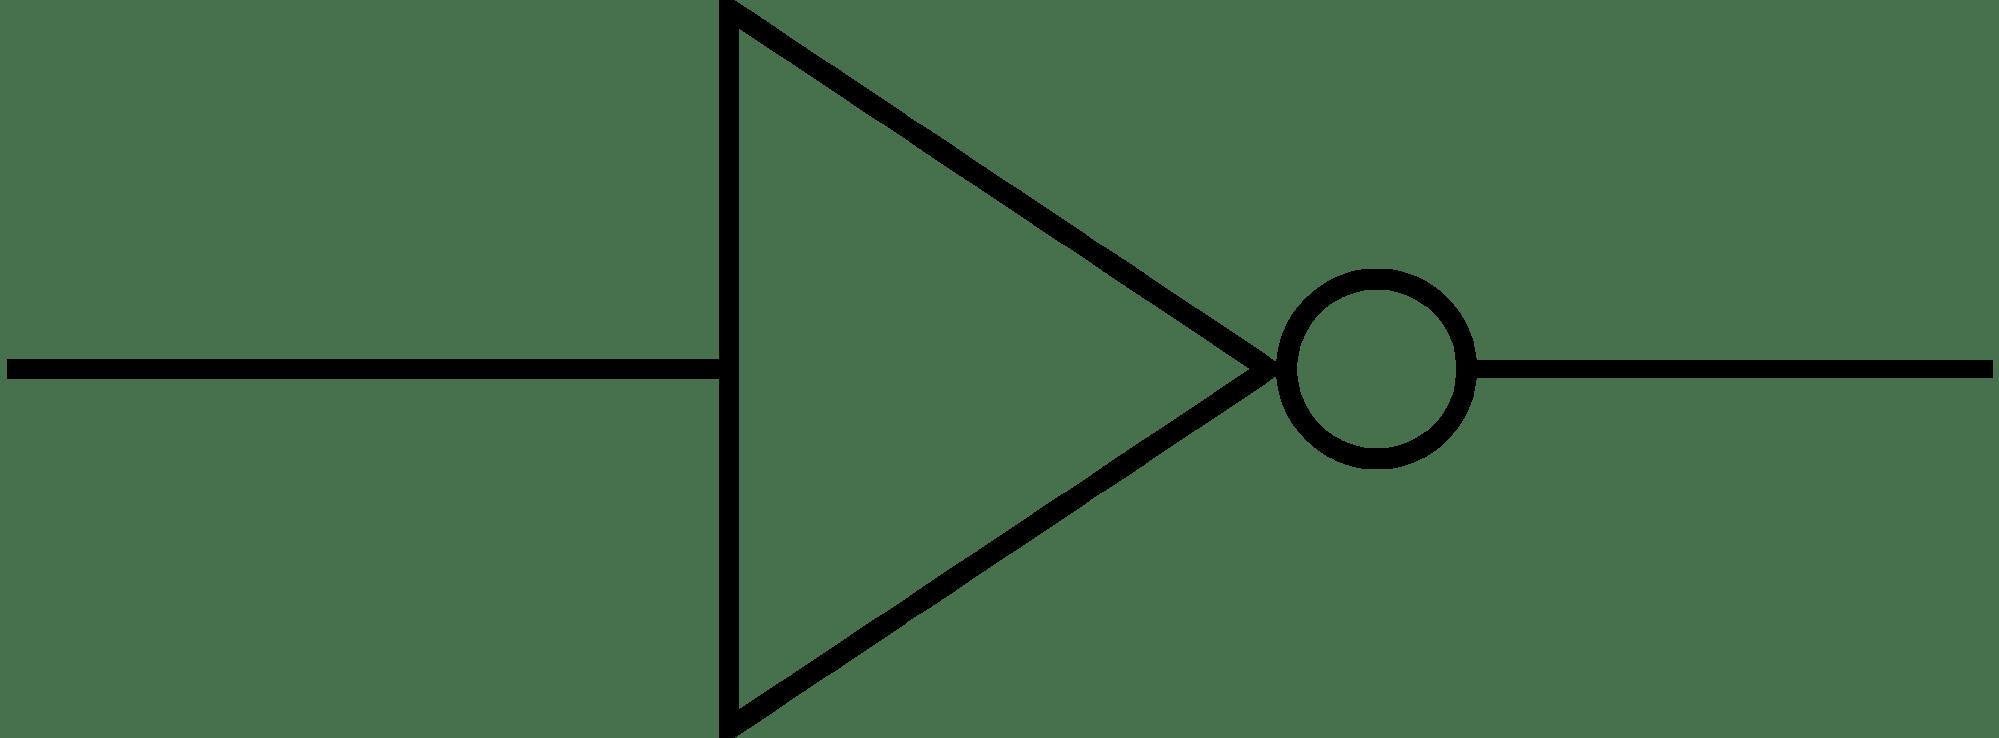 hight resolution of electronic symbol inverter wiring diagram electronics